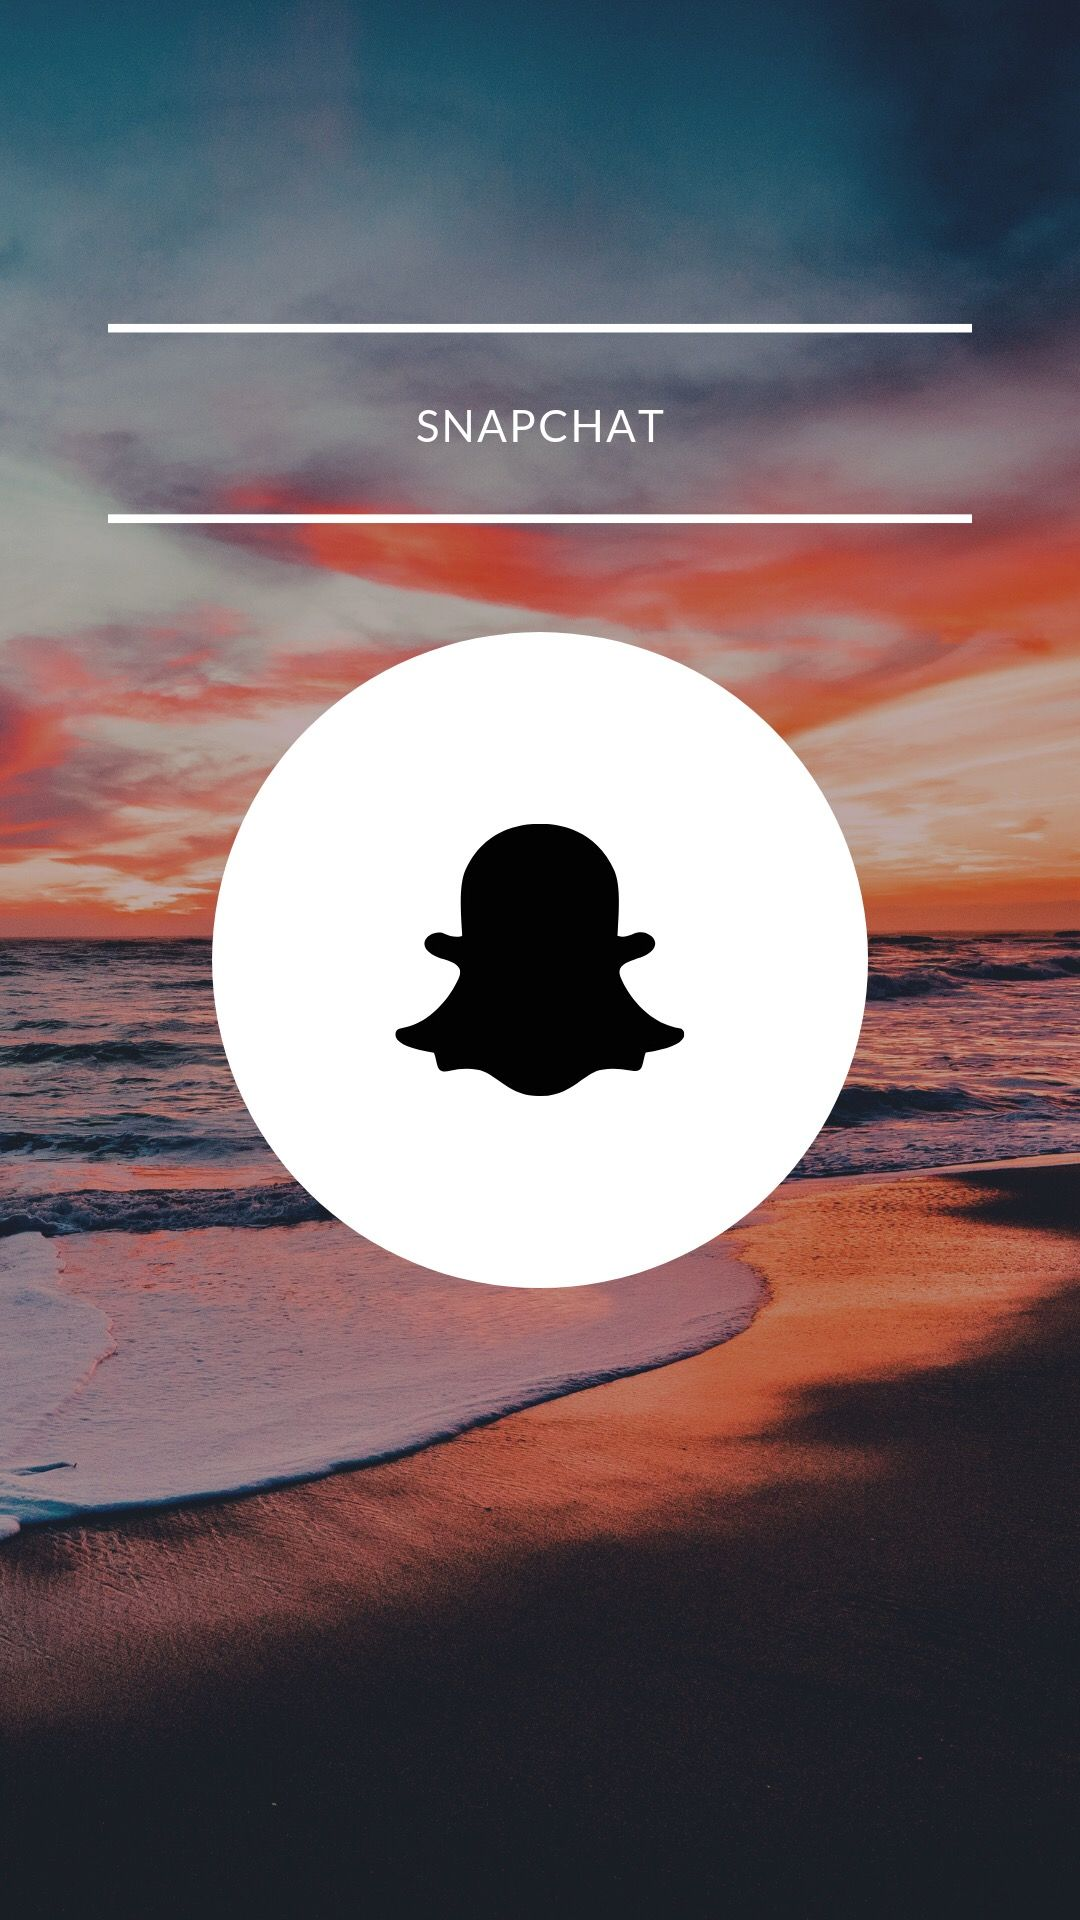 Snapchat logo Snapchat logo, Instagram logo, Instagram